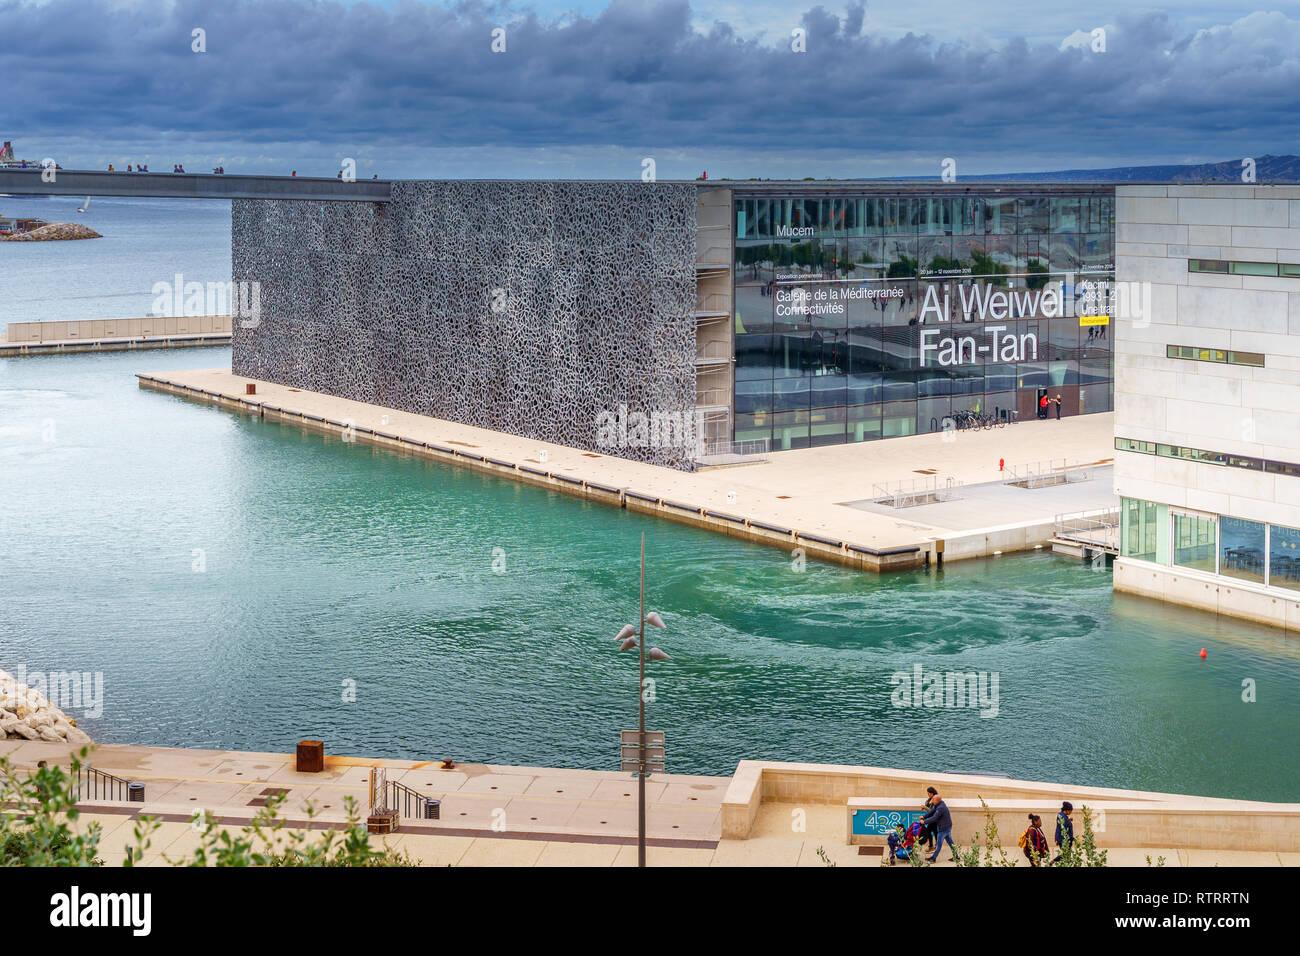 MARSEILLE, FRANCE - 10 Nov 2018 - Museum of European and Mediterranean Civilisations - Stock Image